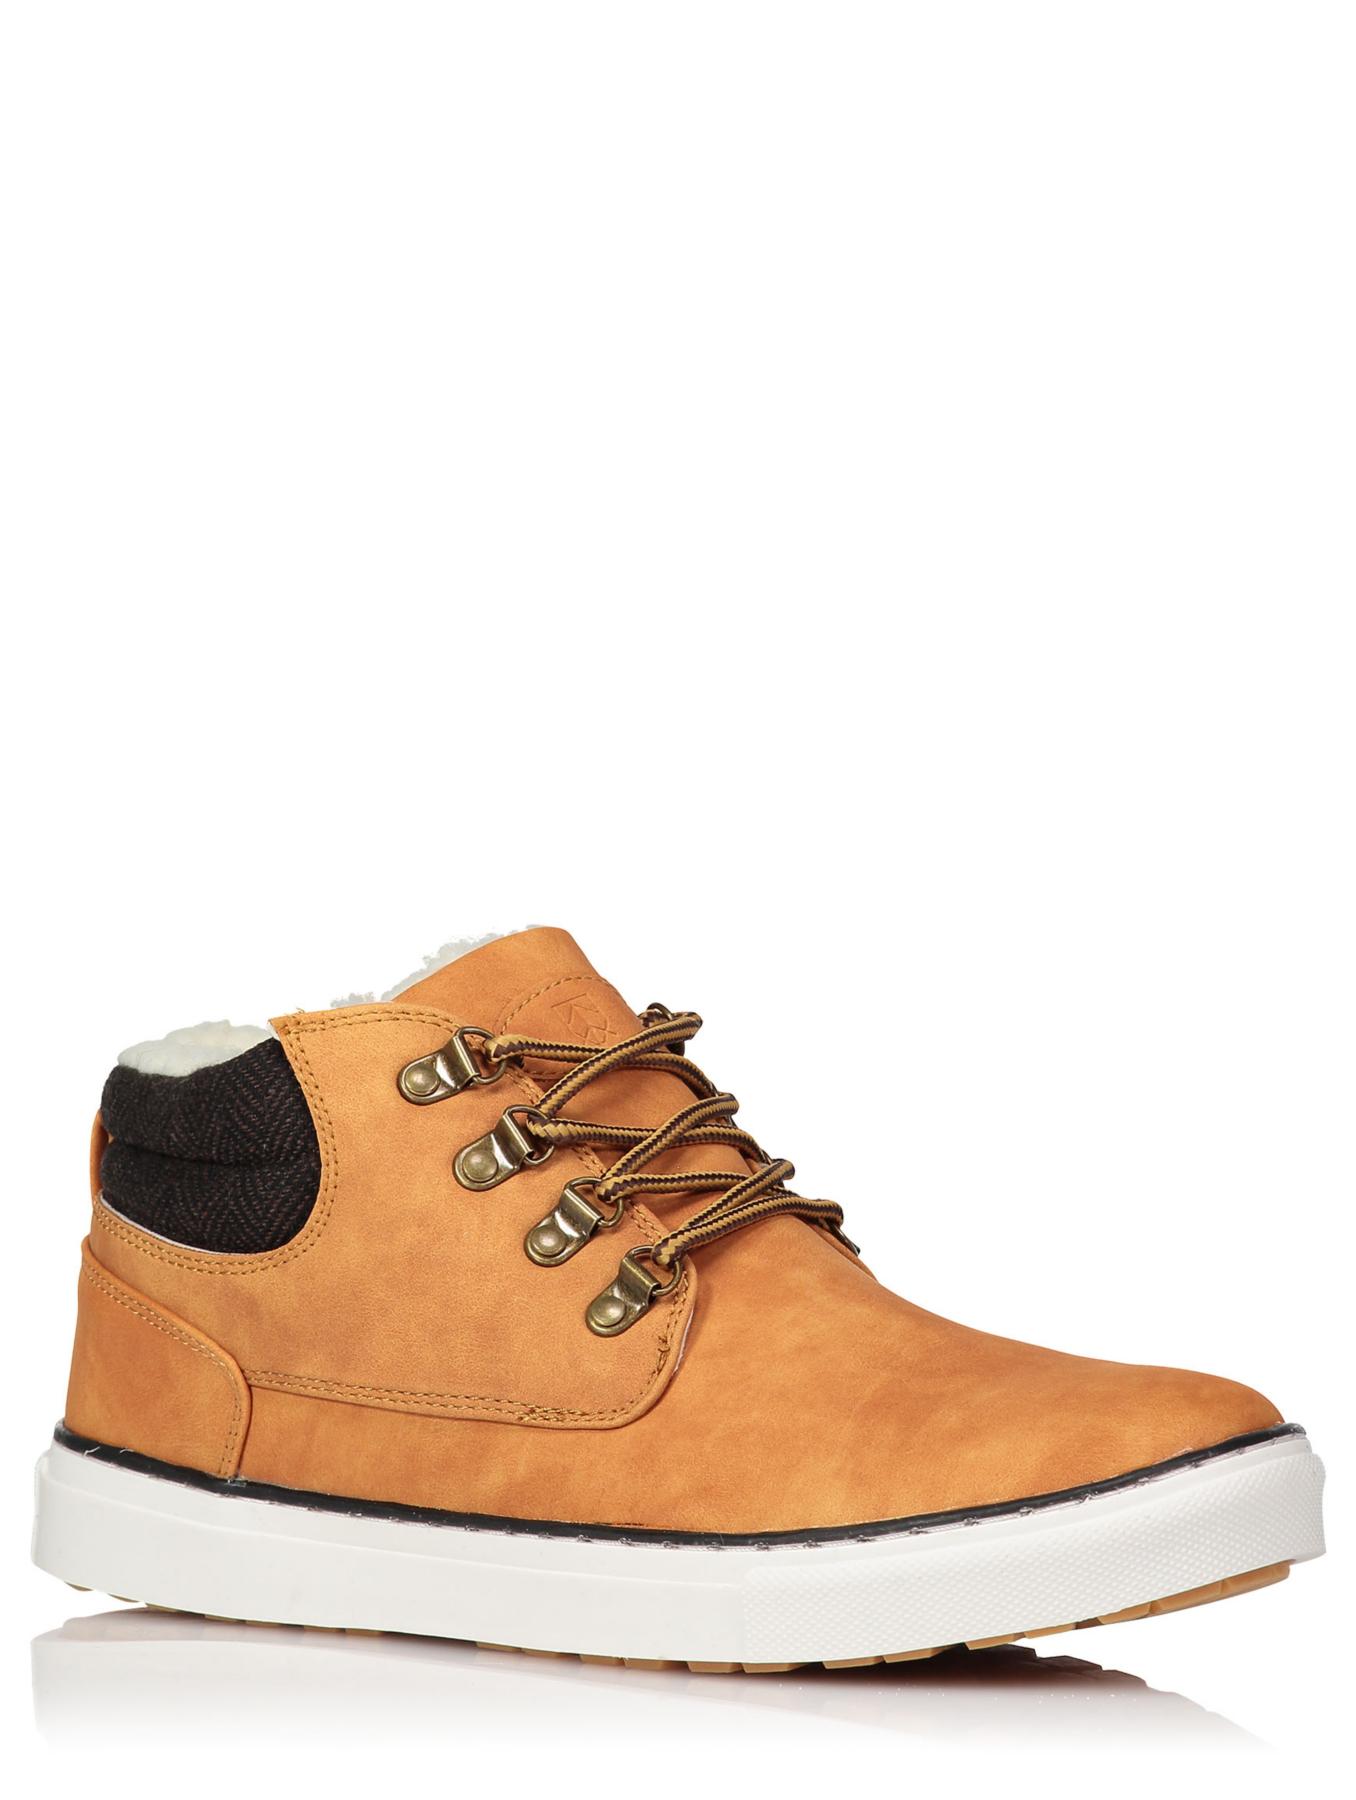 Boots & Wellies Shoes Men